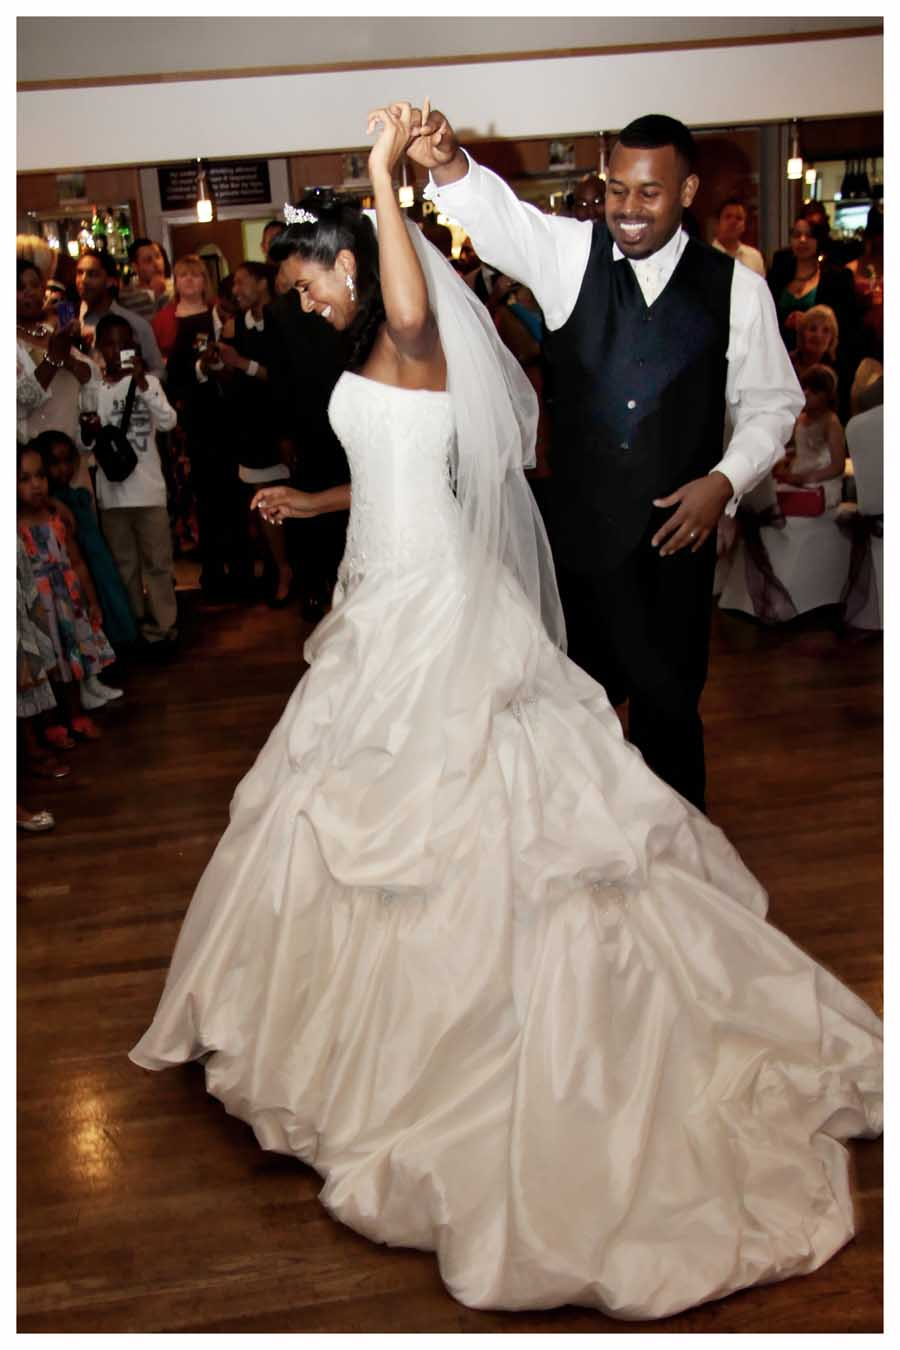 1ST DANCE Photos by  Simeon  Thaw copyright 2014 (24).jpg